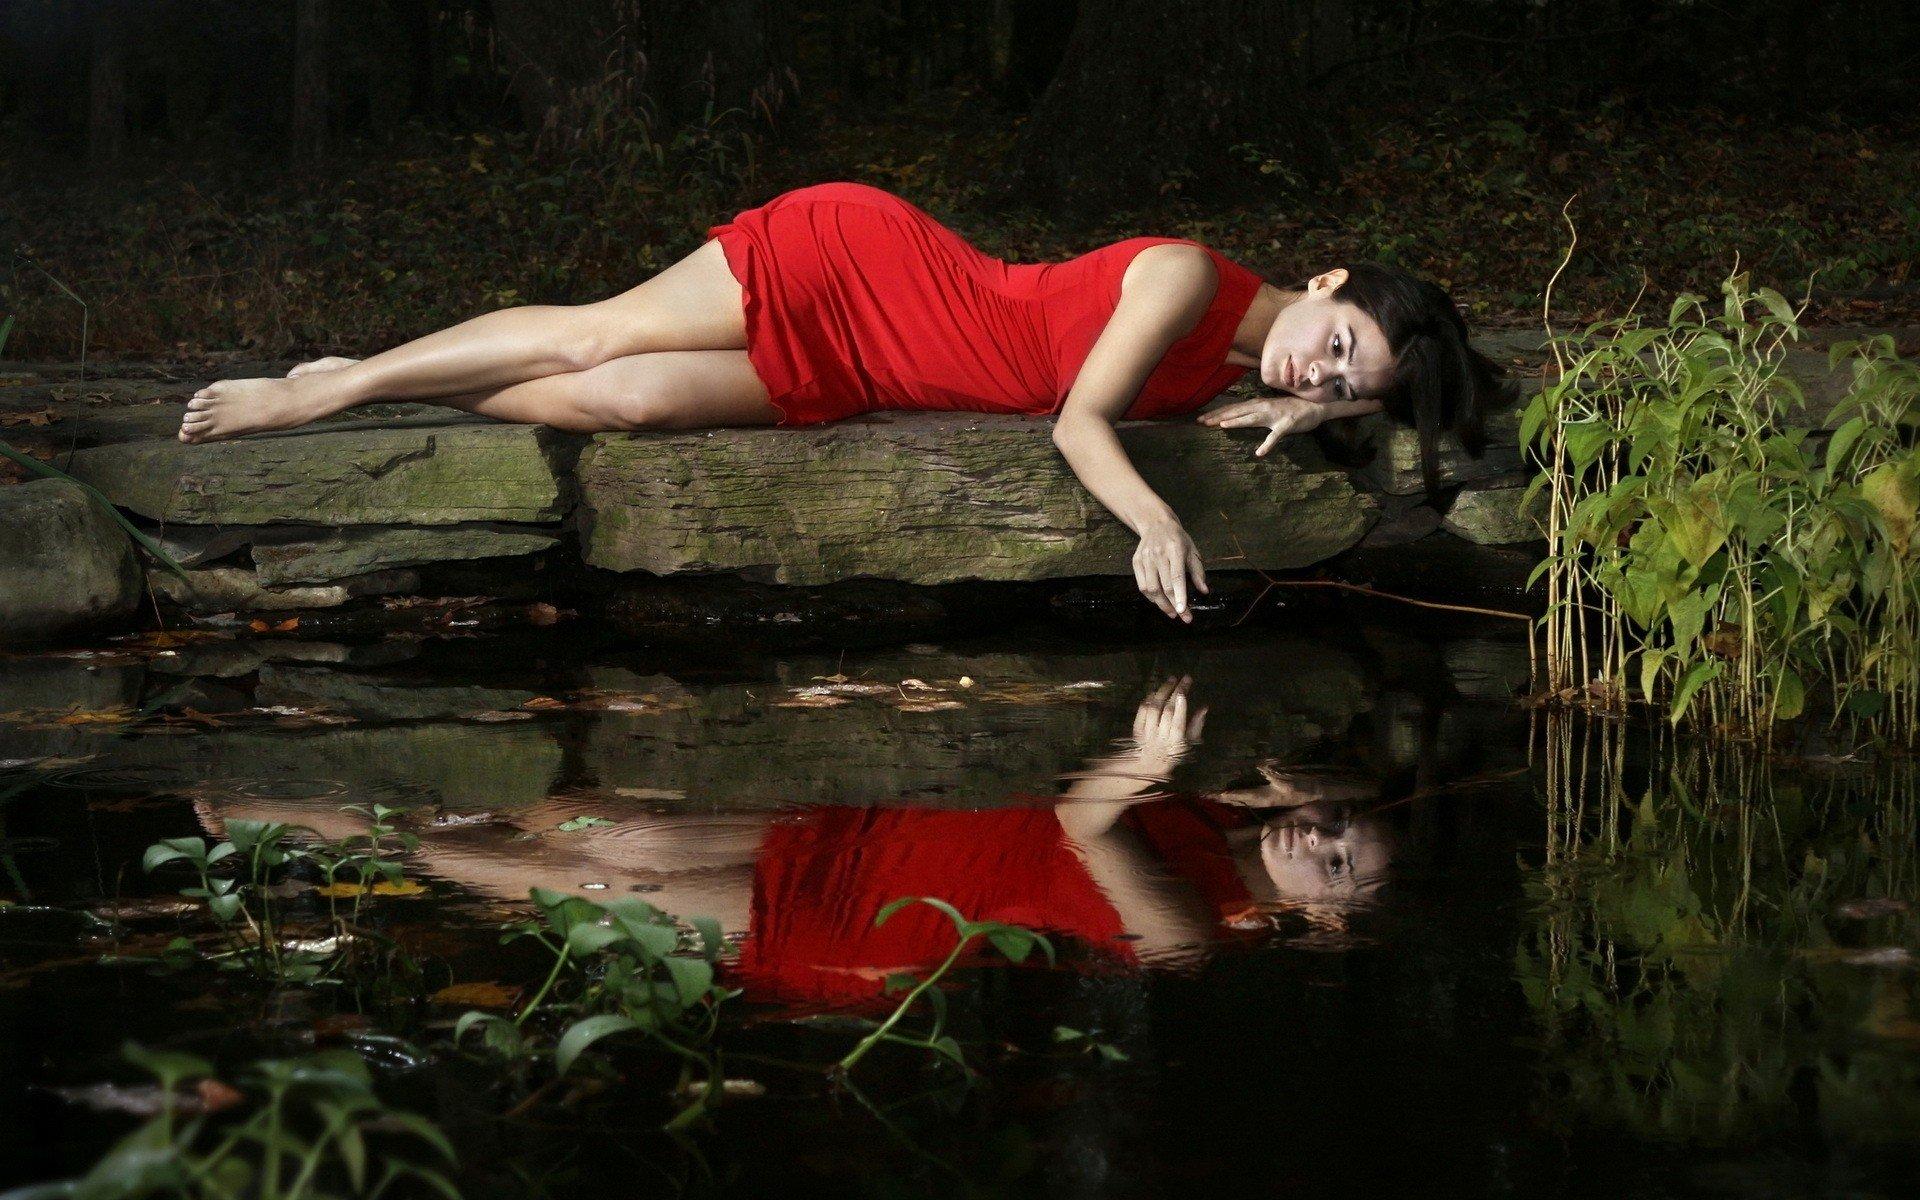 women, Model, Brunette, Long hair, Women outdoors, Nature, Red dress, Barefoot, Water, Lake, Reflection, Dress, Legs, Dark hair Wallpaper